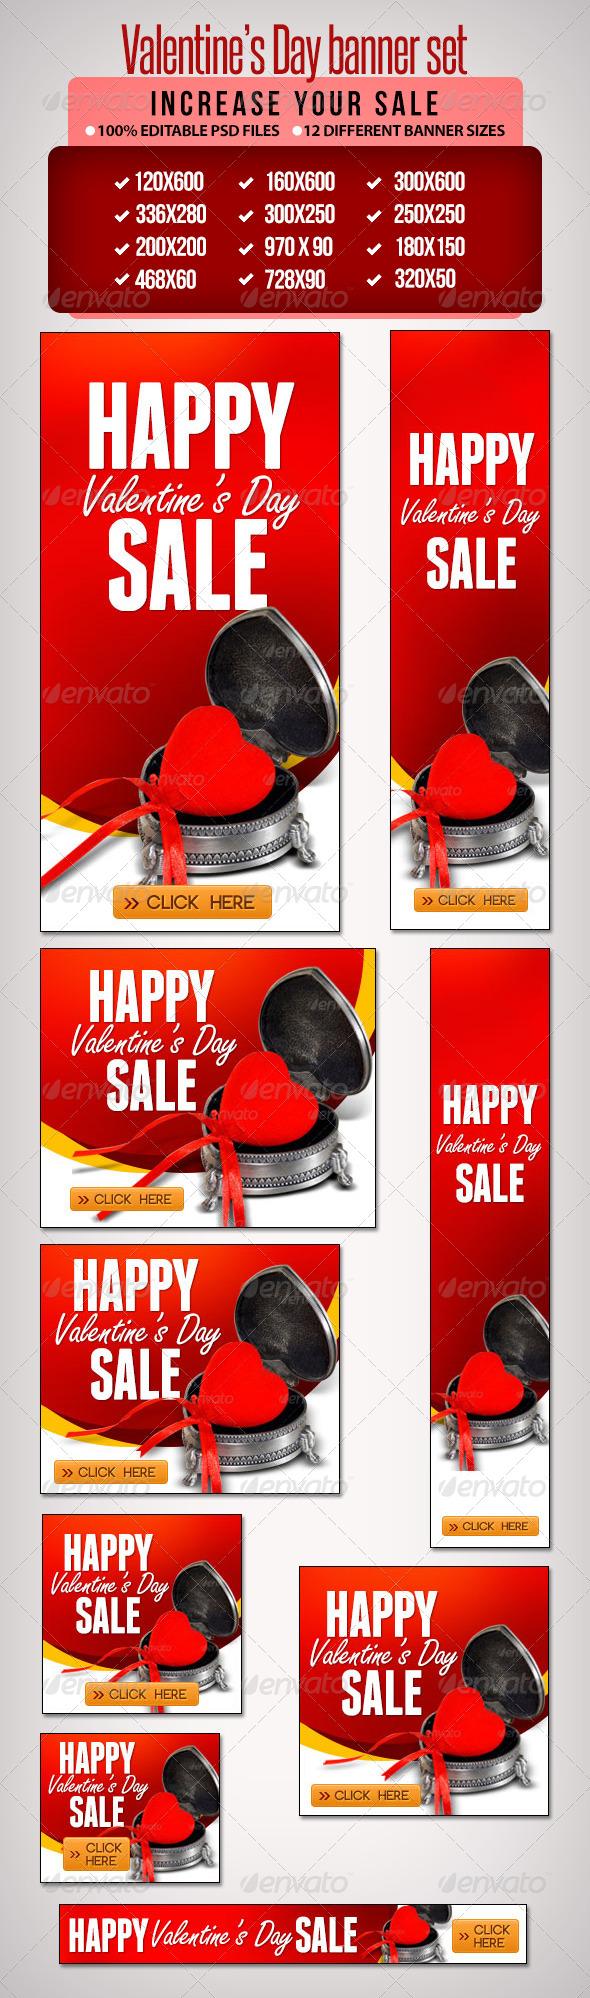 GraphicRiver Valentine s Day Banner Set 6 6607496